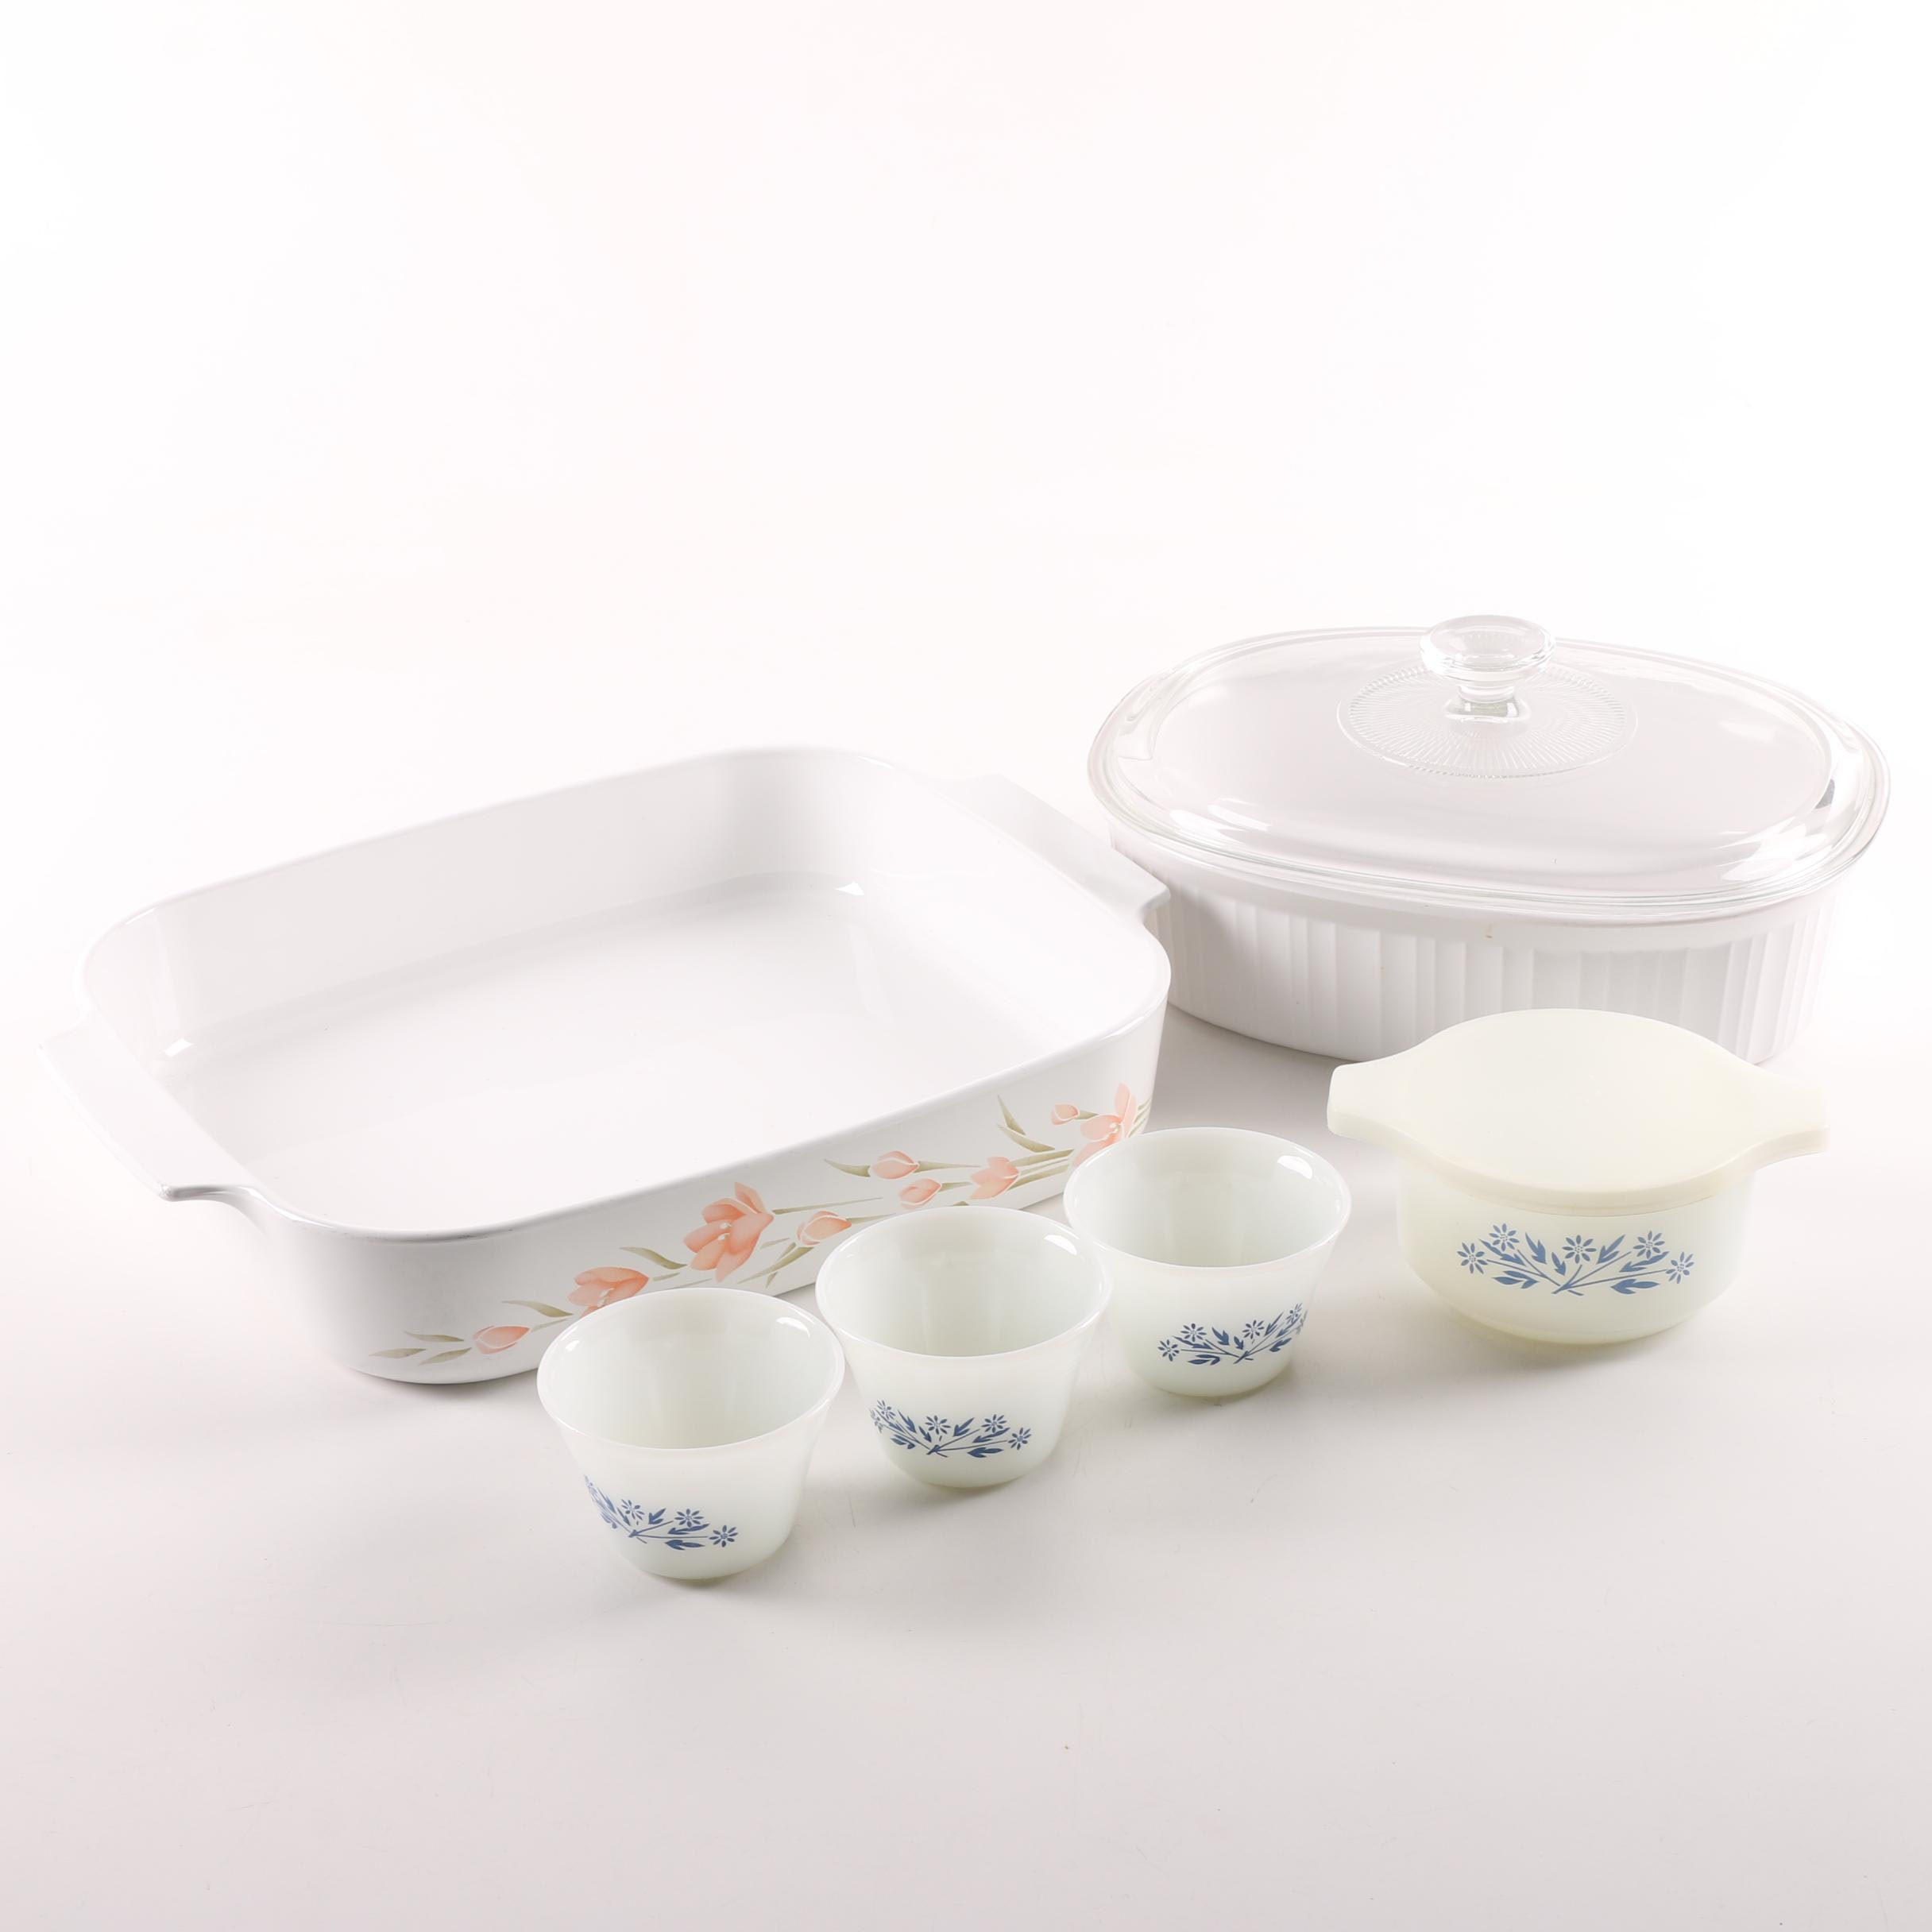 Py-Ro-Rey Baking Dishes, Corning Ware Casserole and Ceramic Lasagna Pan